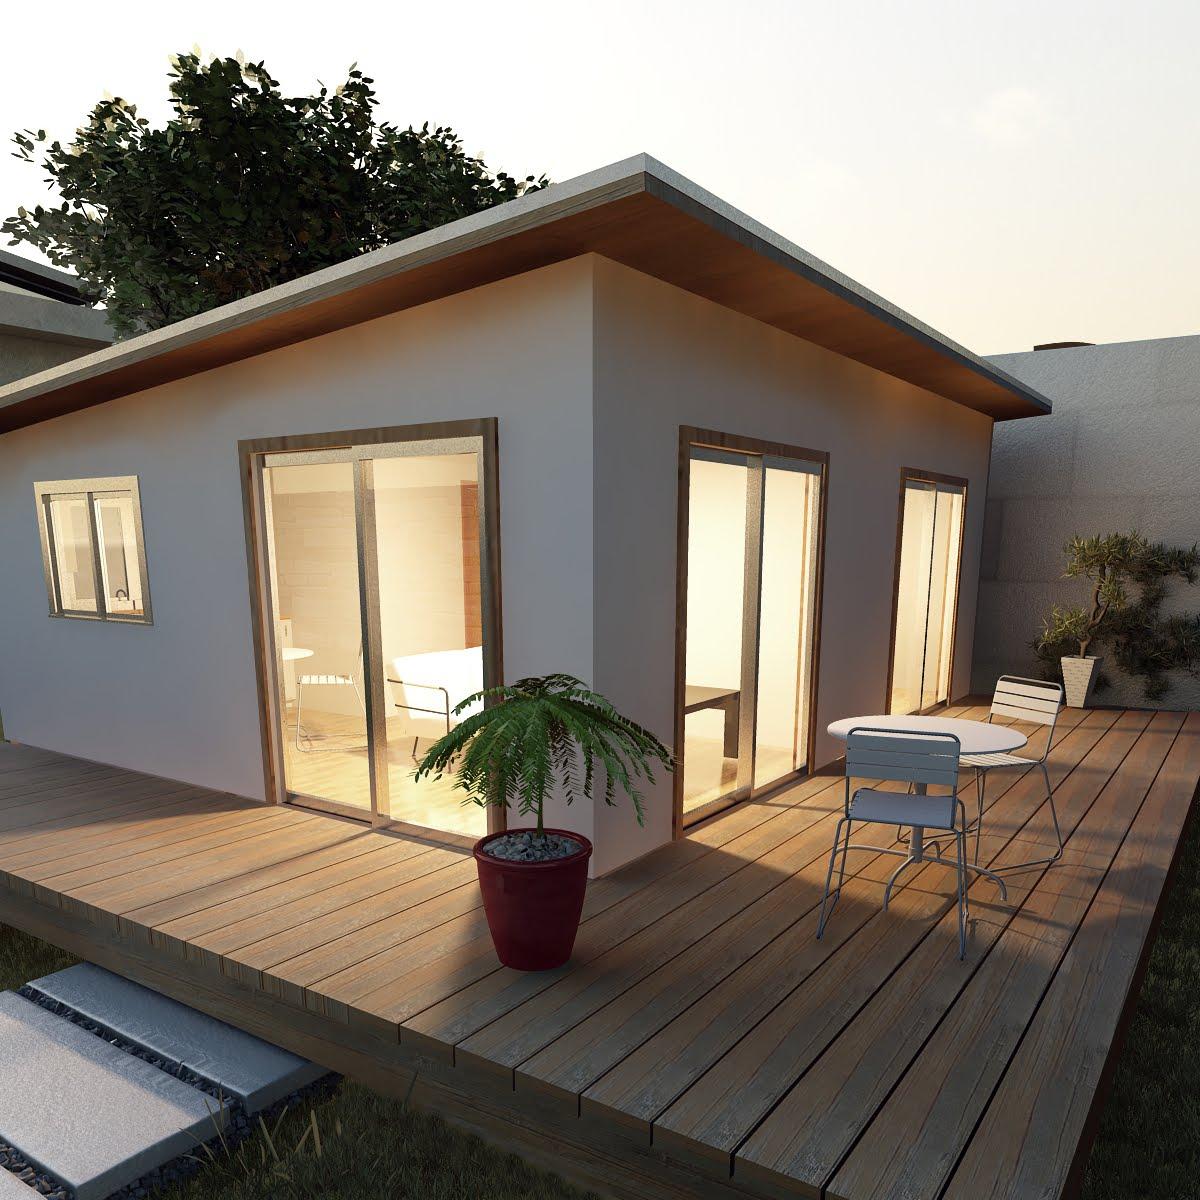 Designs Of Home Designs October - Mini home design